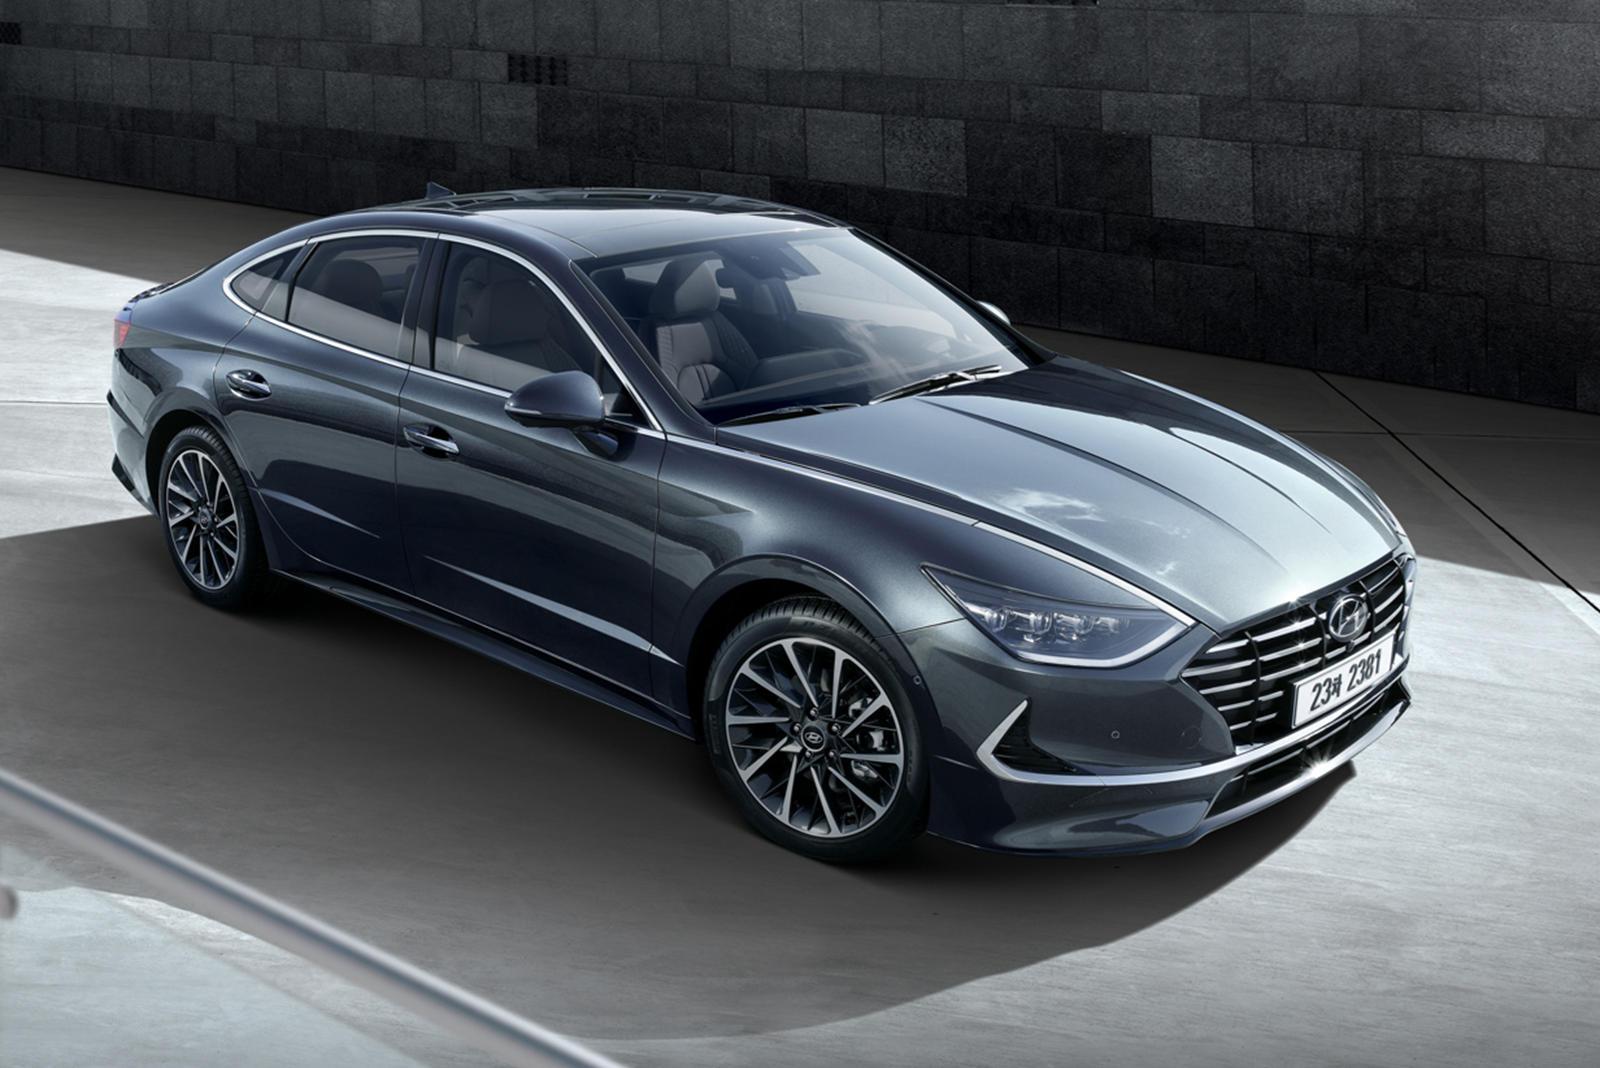 2020 Hyundai Sonata Revealed With Sleek New Design | CarBuzz